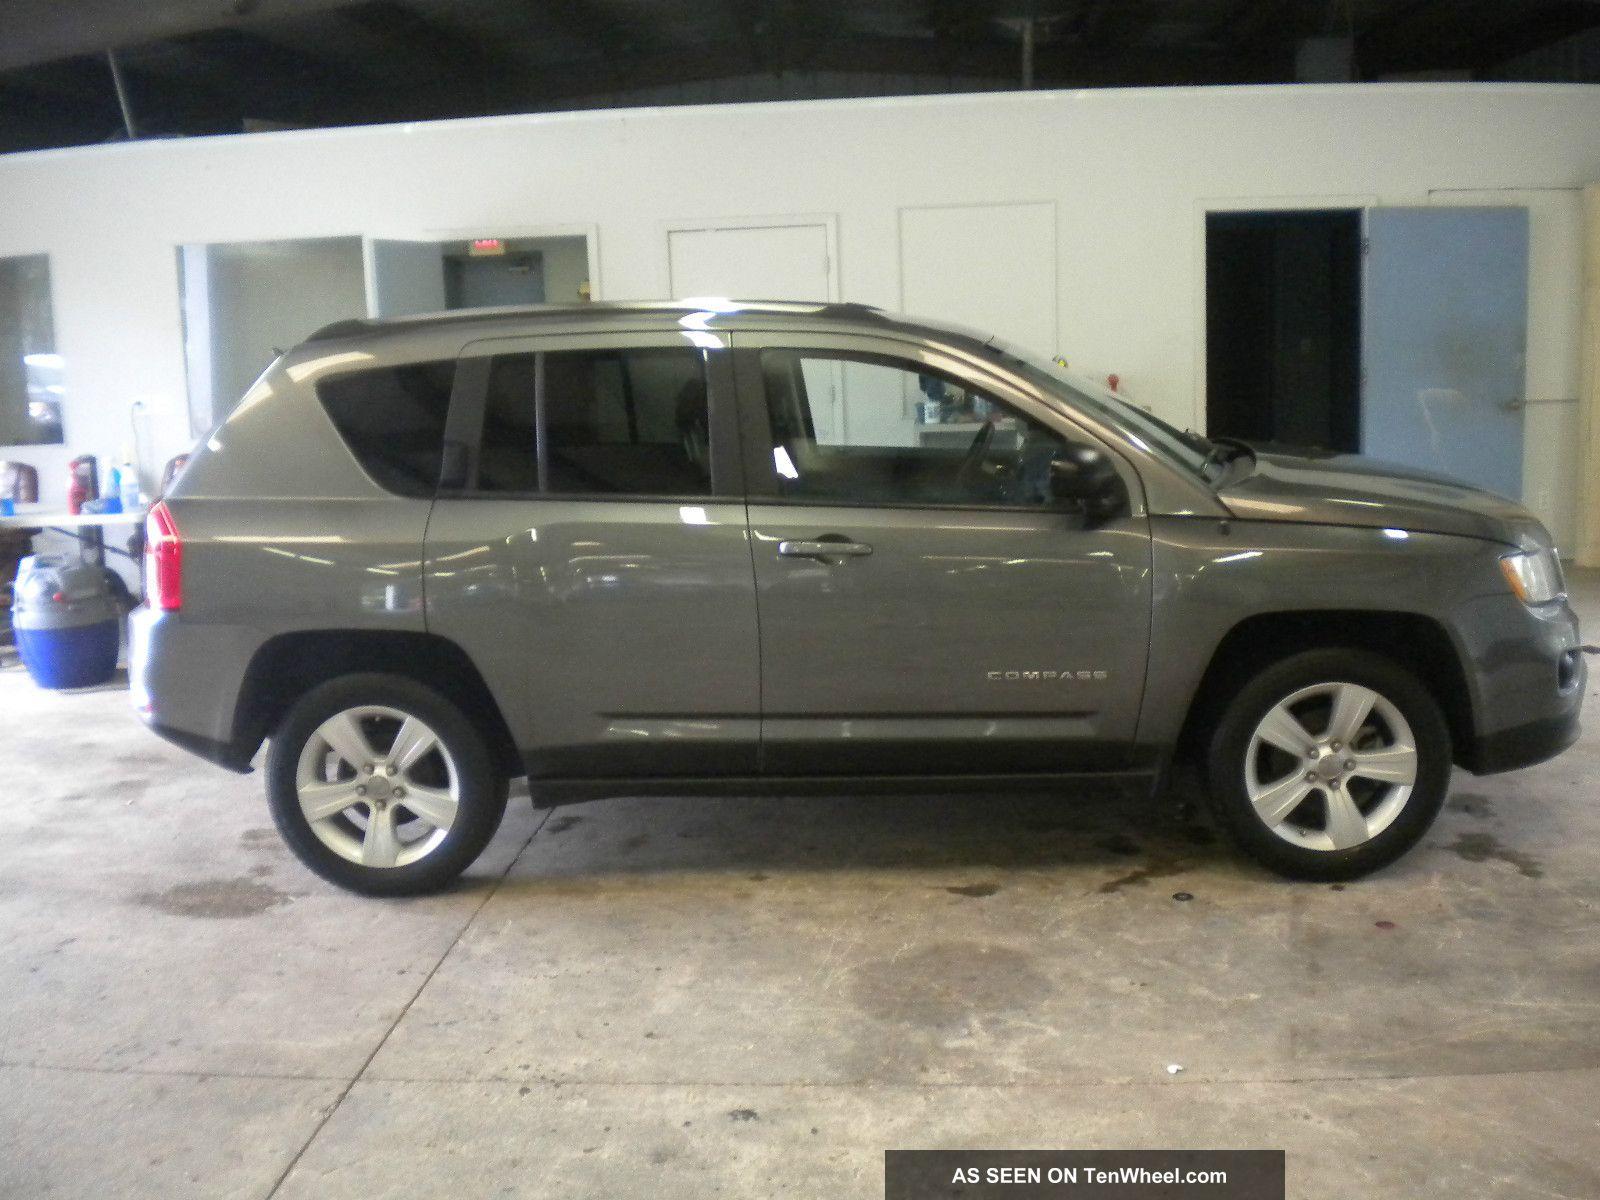 2011 jeep compass 4x4 4 wheel drive rebuildable project car. Black Bedroom Furniture Sets. Home Design Ideas